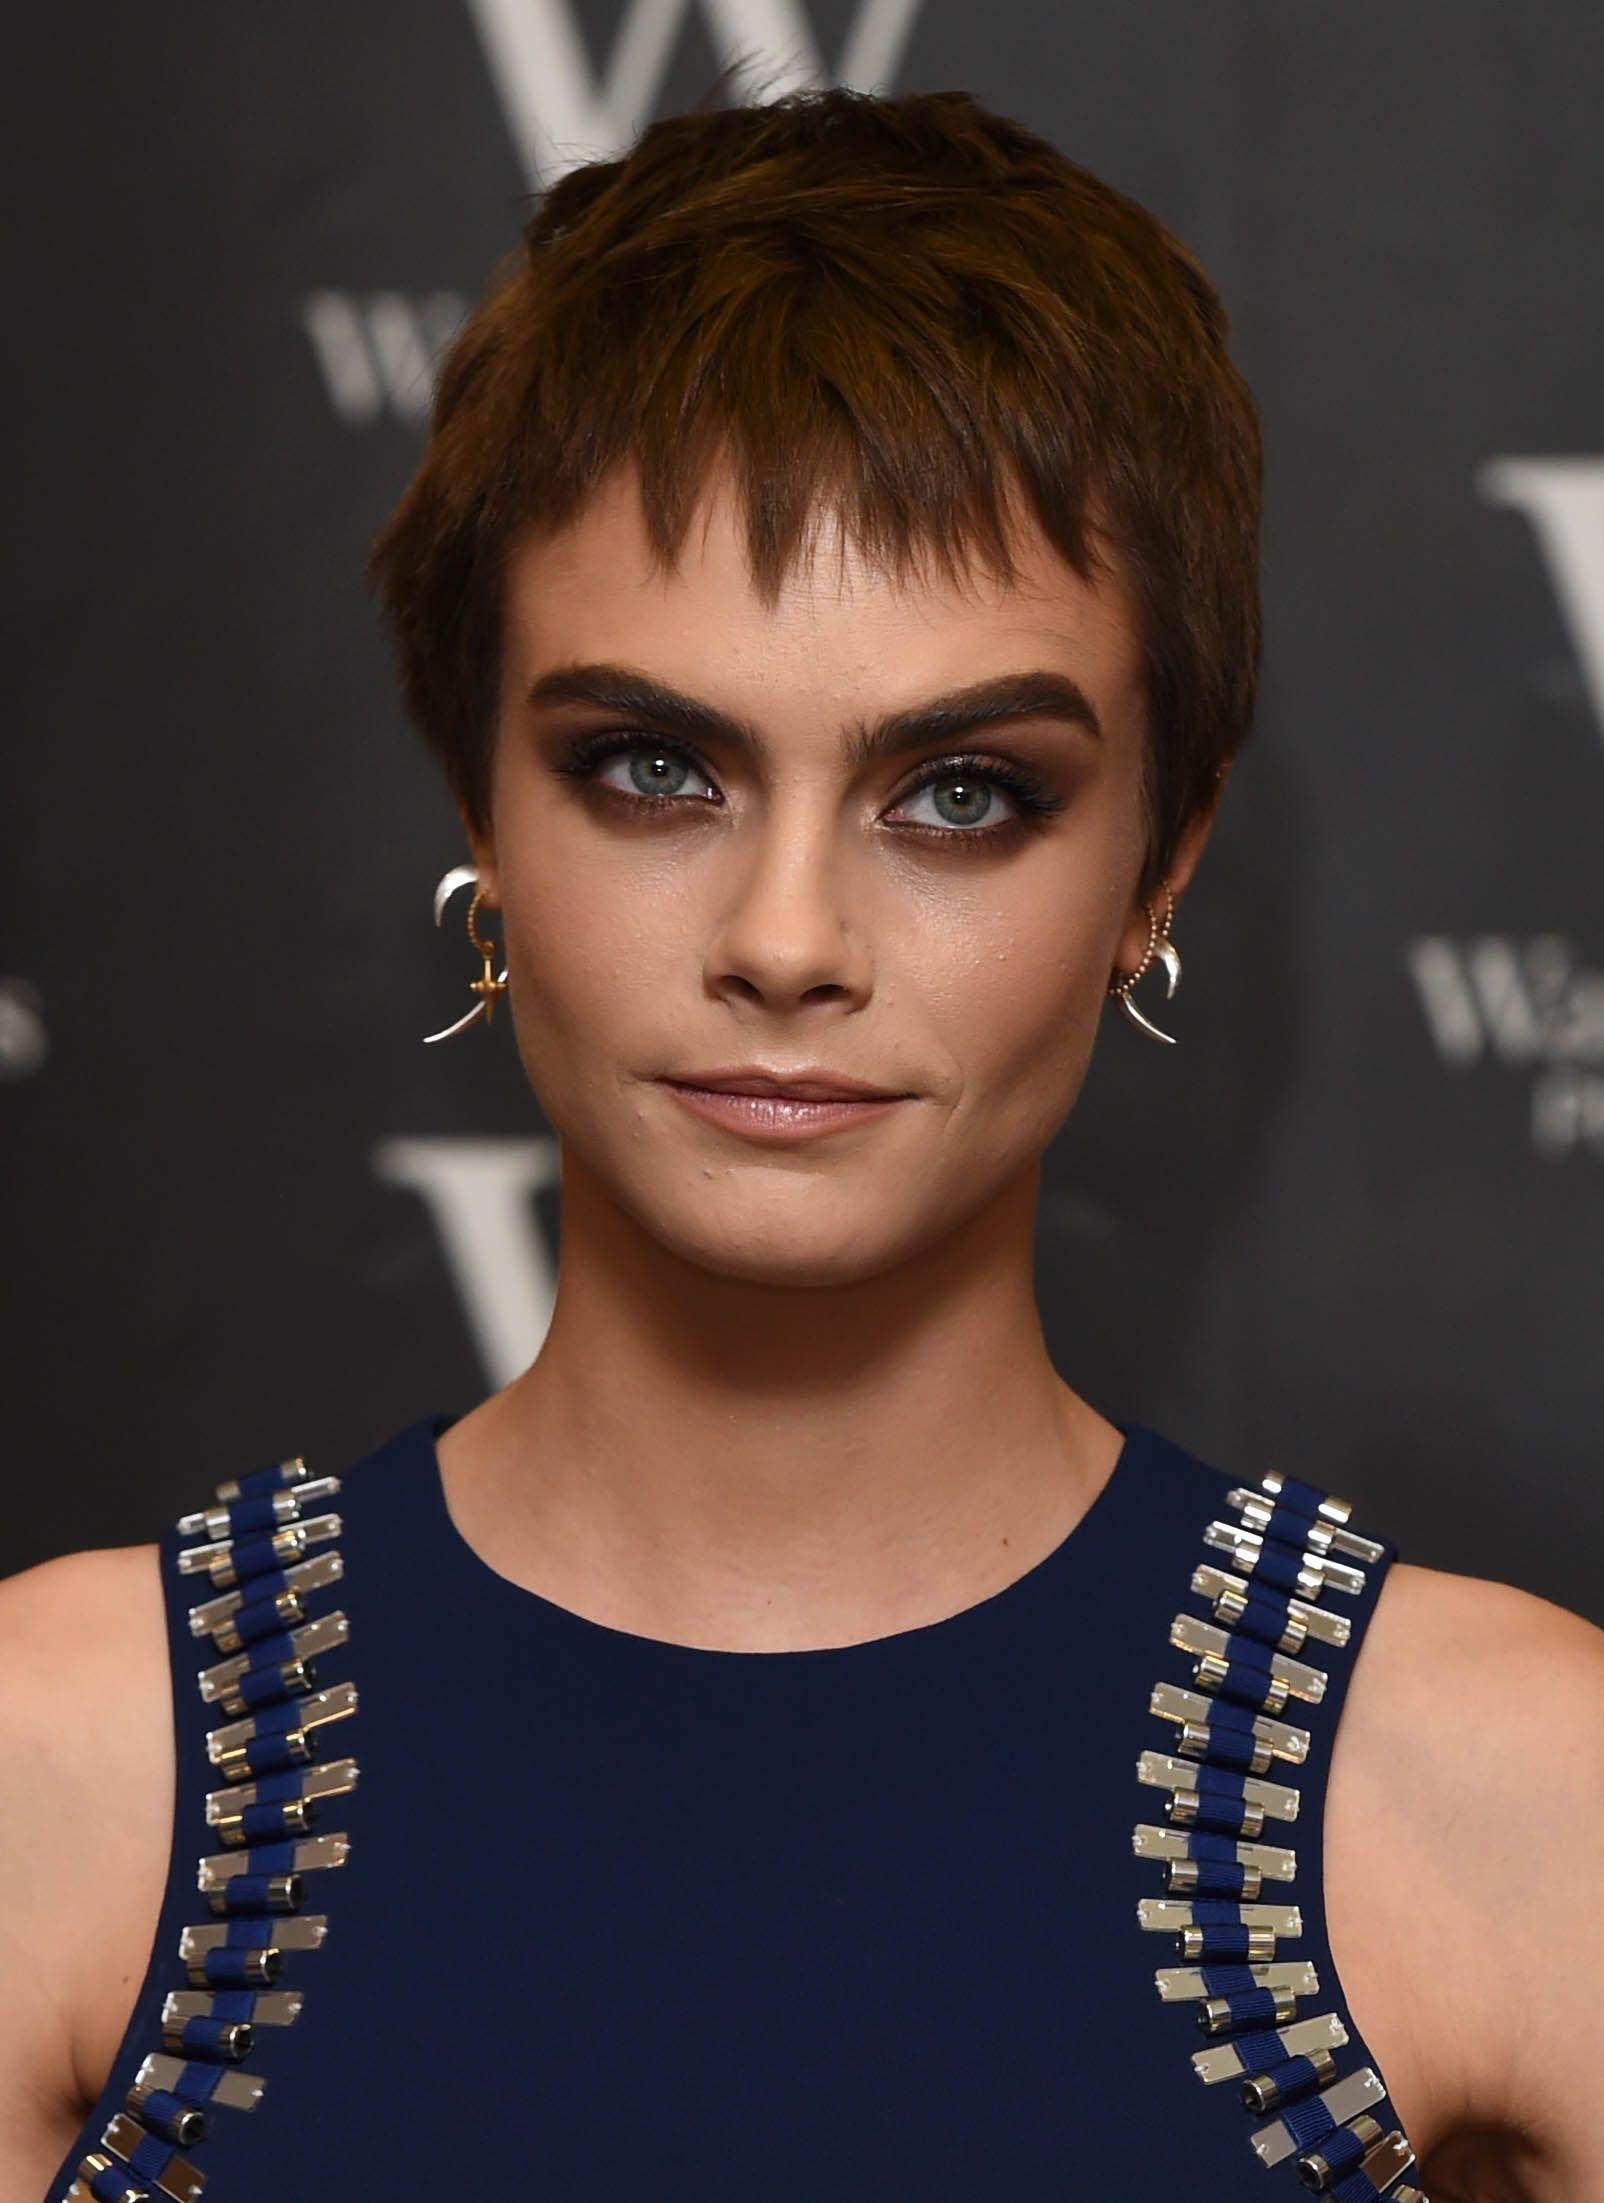 Cara Delevingne: The New Audrey Hepburn Umm picture